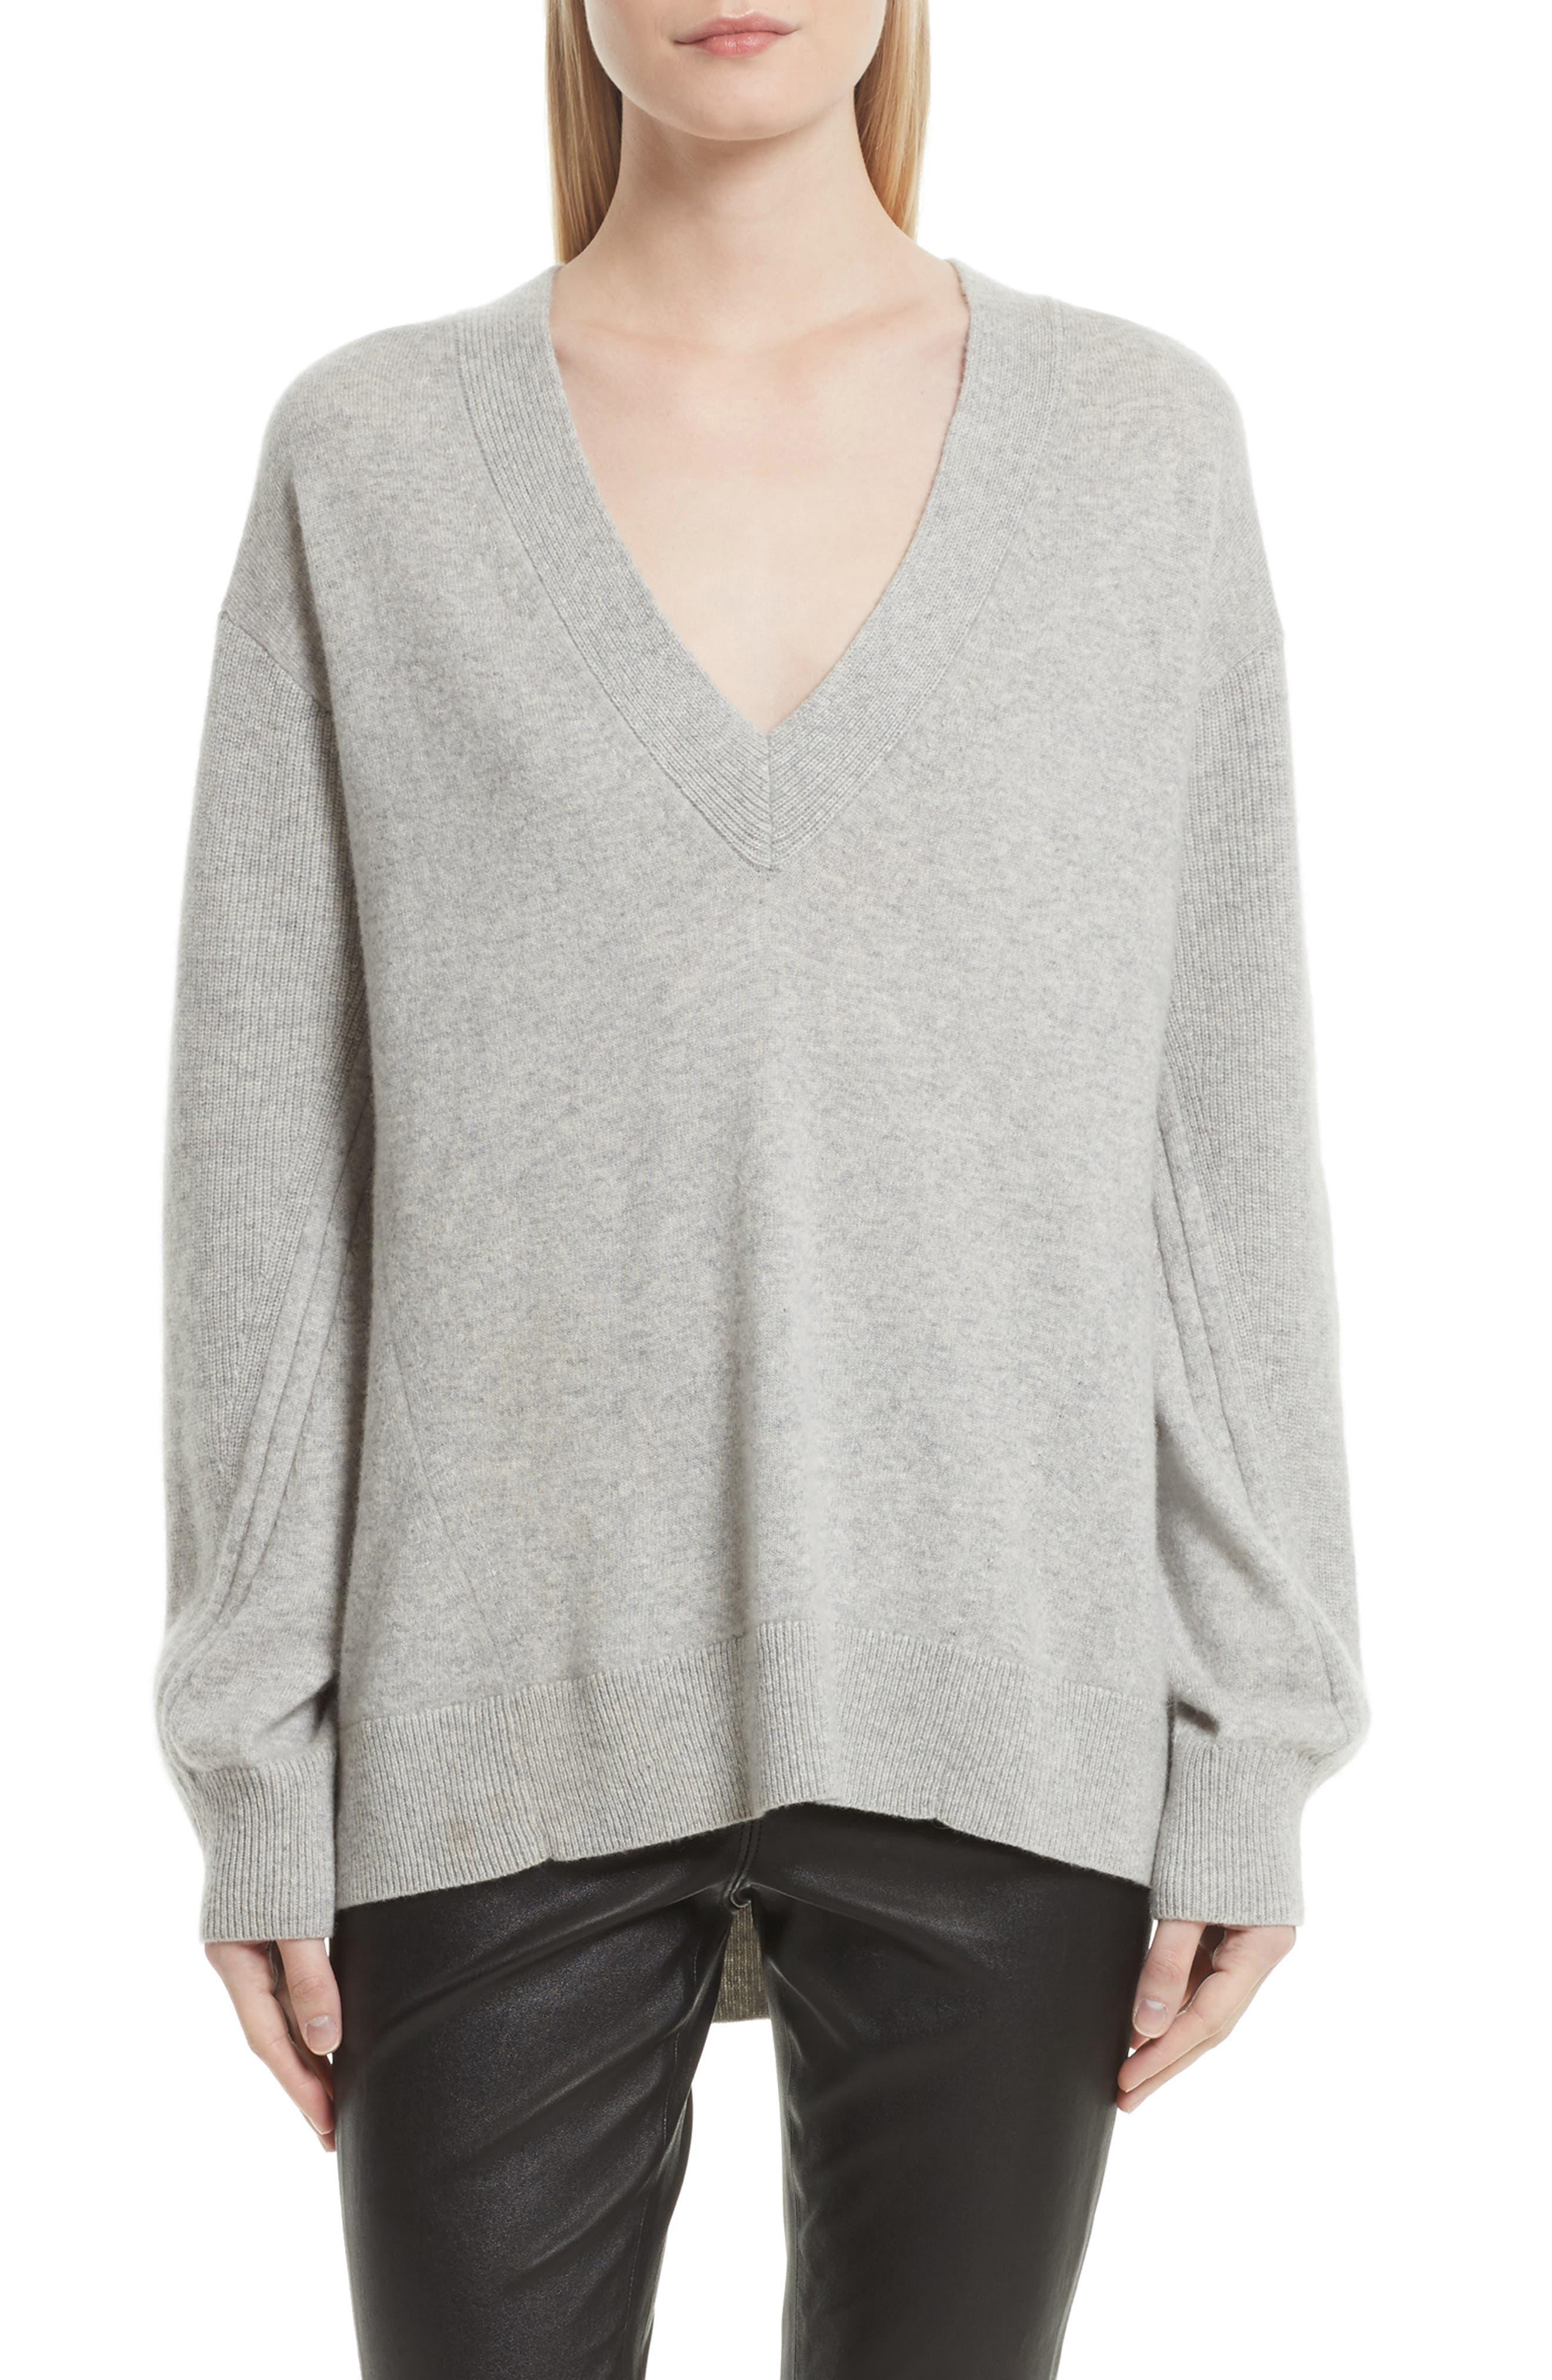 Ace Cashmere Sweater,                         Main,                         color, 058